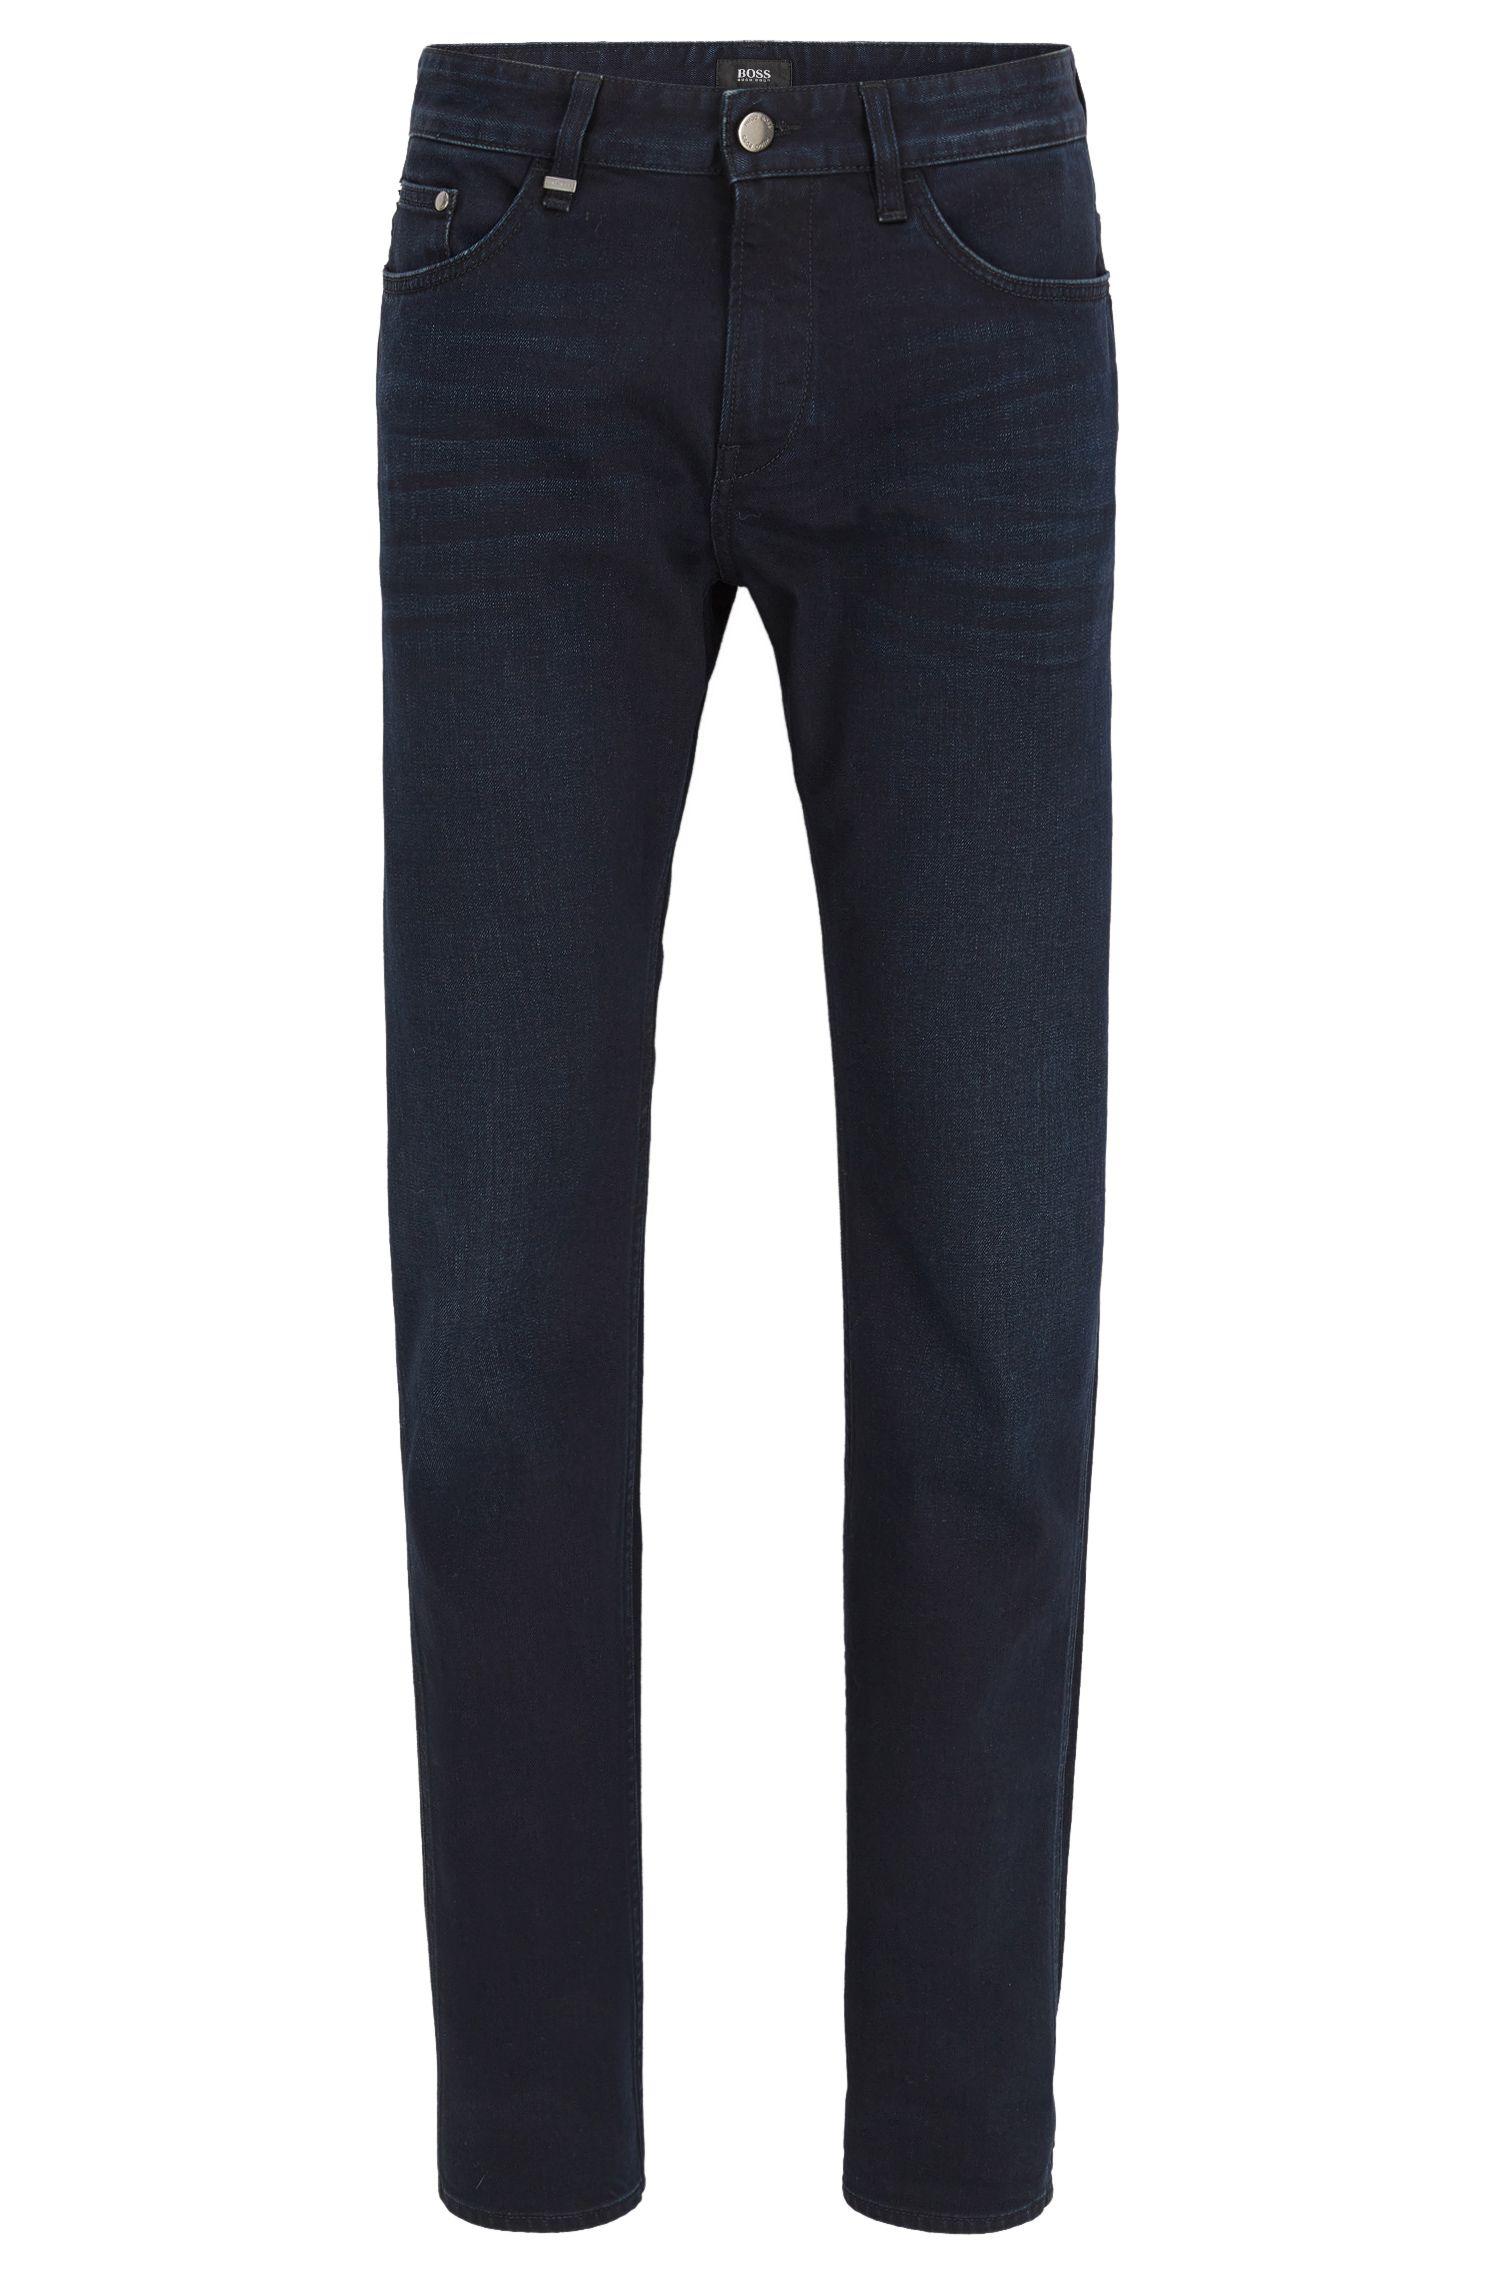 Blauw-zwarte slim-fit jeans van comfortabele stretchdenim